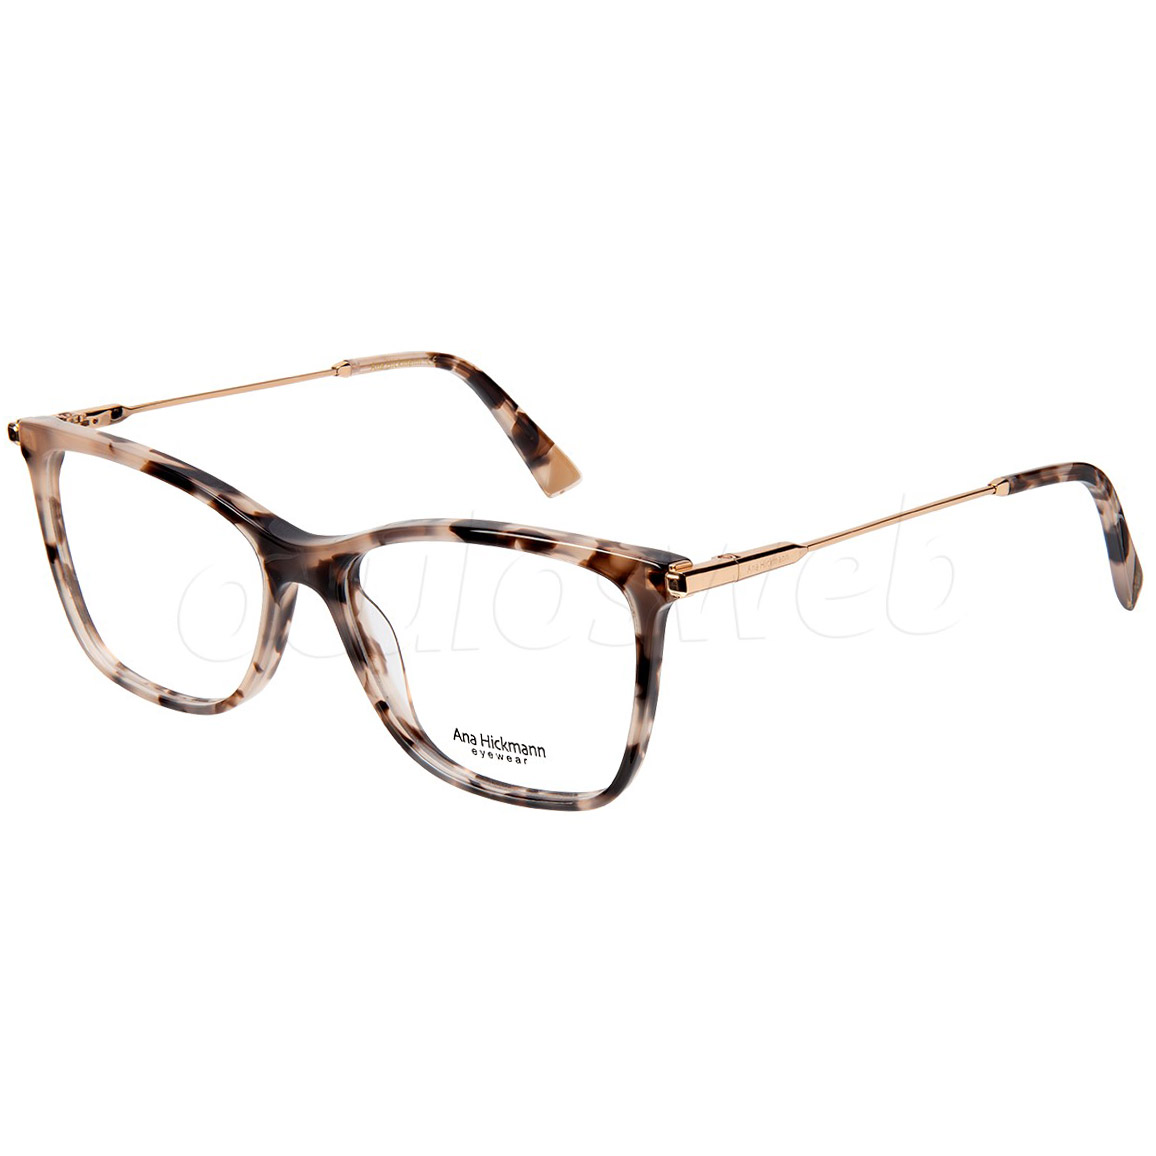 Óculos de Grau Feminino Ana Hickmann AH6406 Marrom Havana